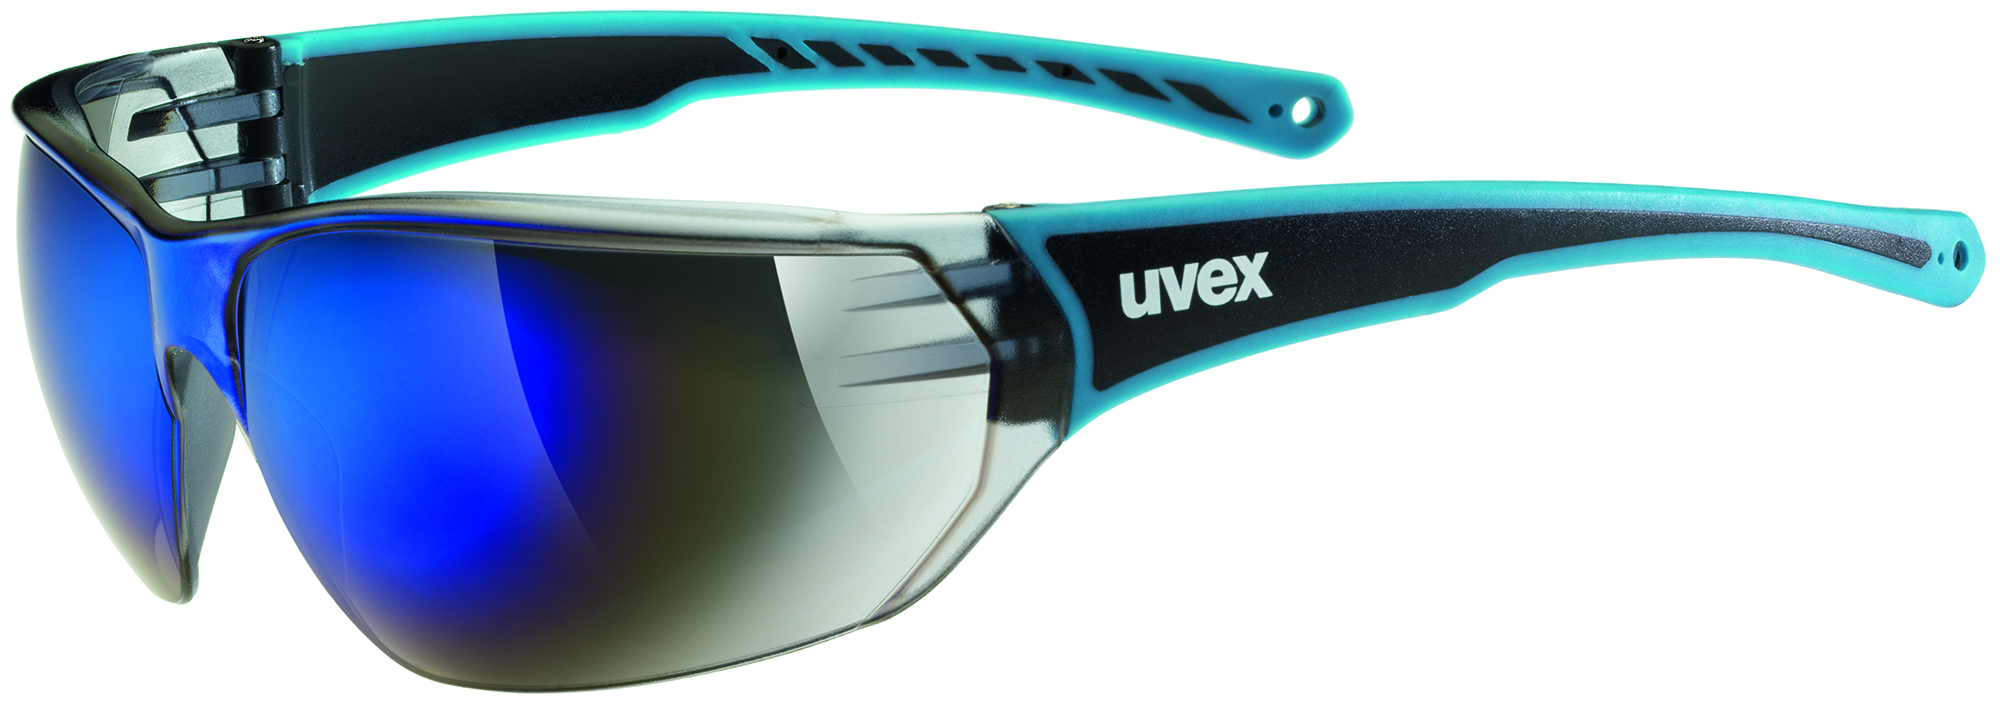 цена на Uvex Солнцезащитные очки Uvex 204